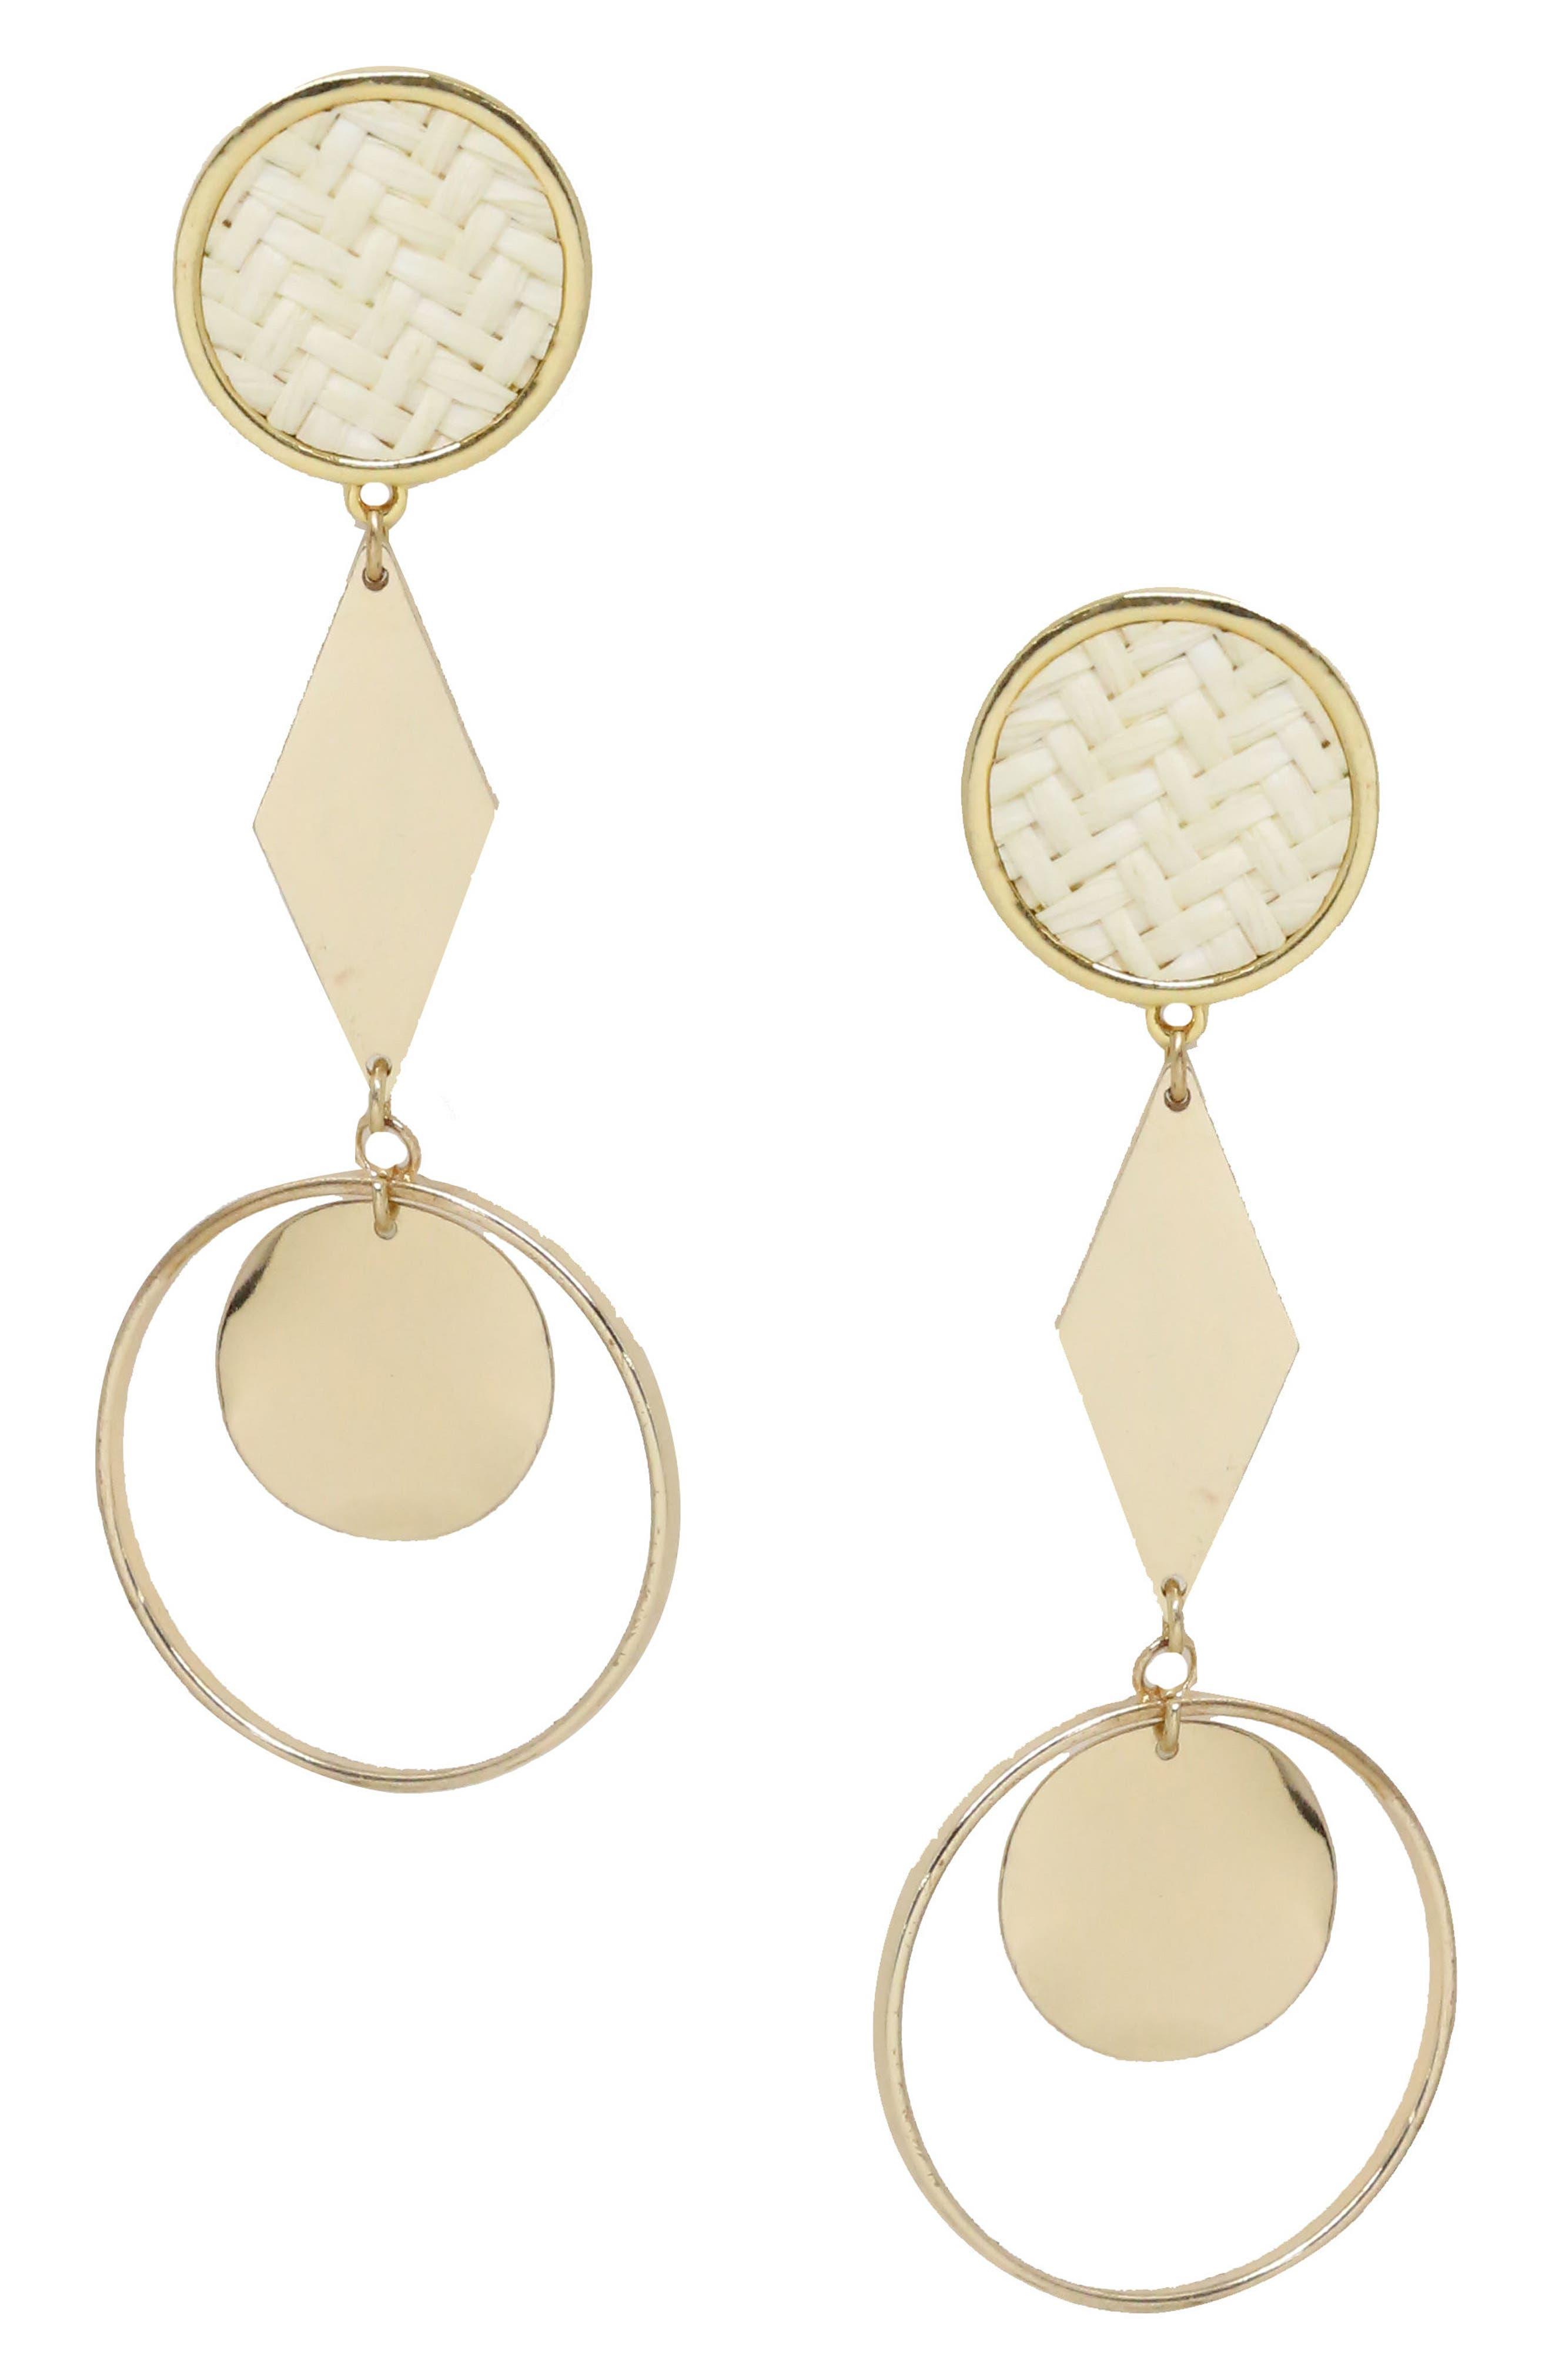 Geo Earrings,                             Main thumbnail 1, color,                             Gold/ Cream